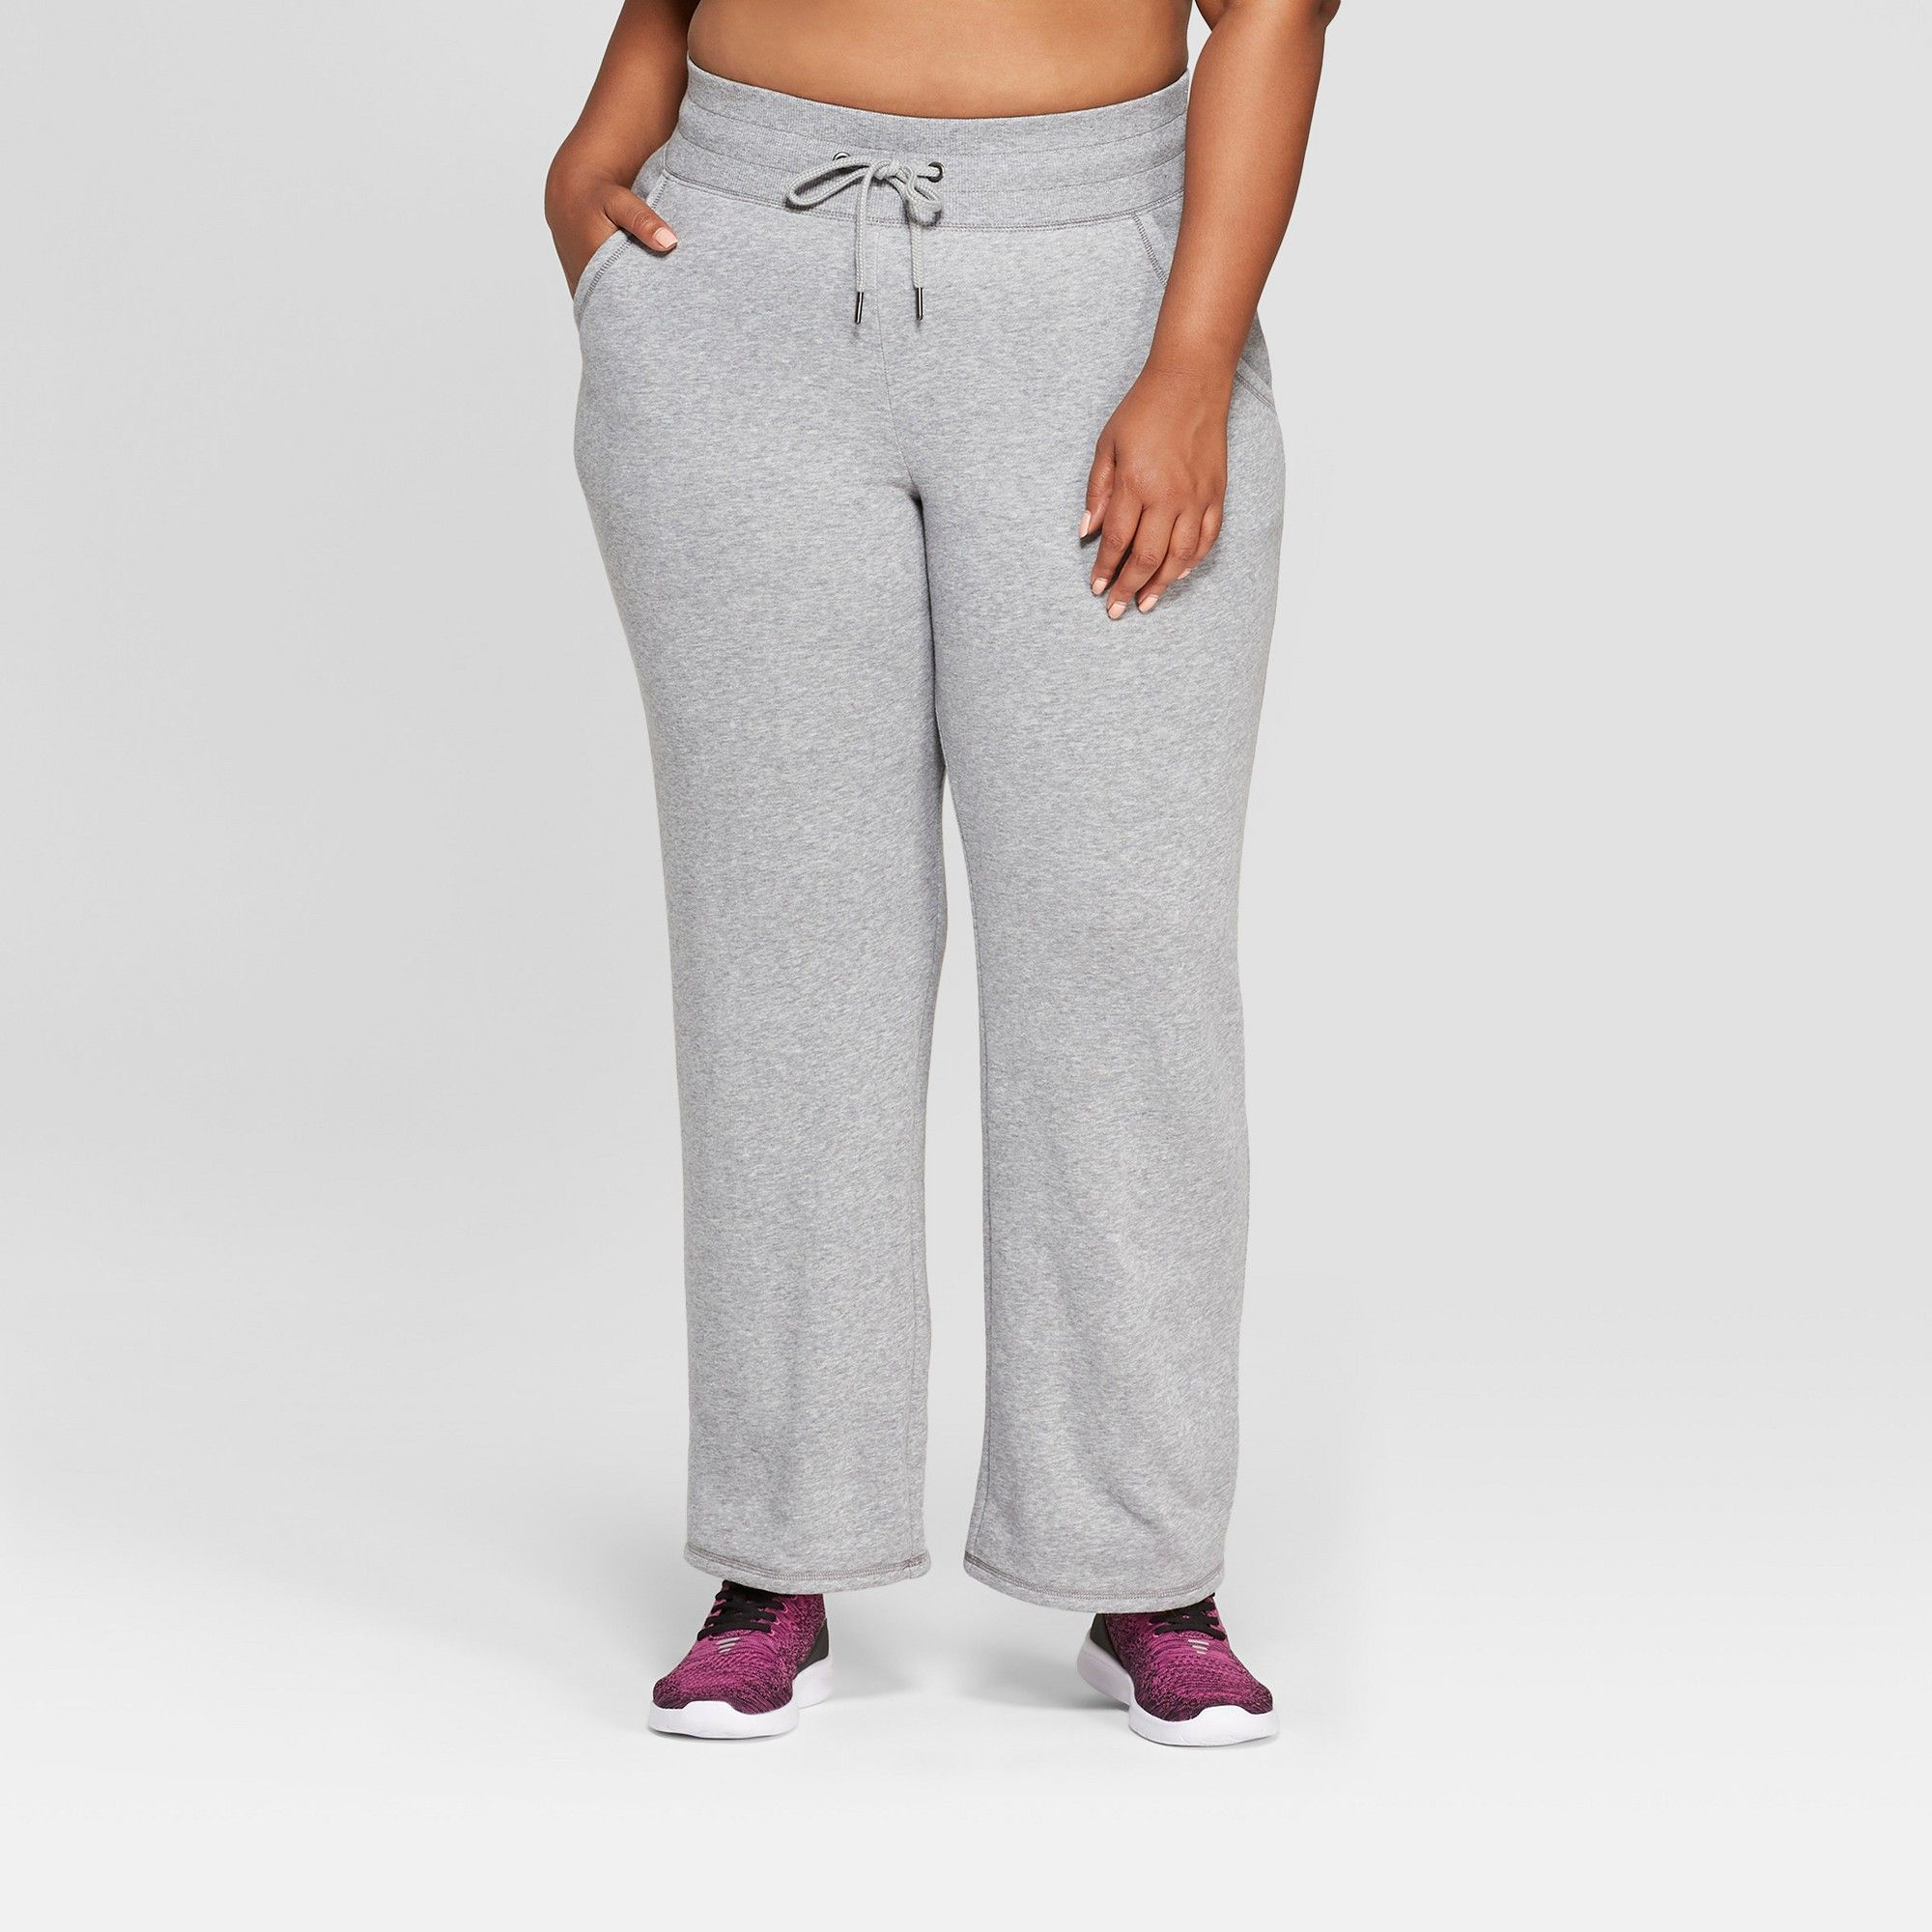 Women s Plus Size Authentic Fleece Sweatpants - C9 Champion Heather Grey 1X 3599784dd